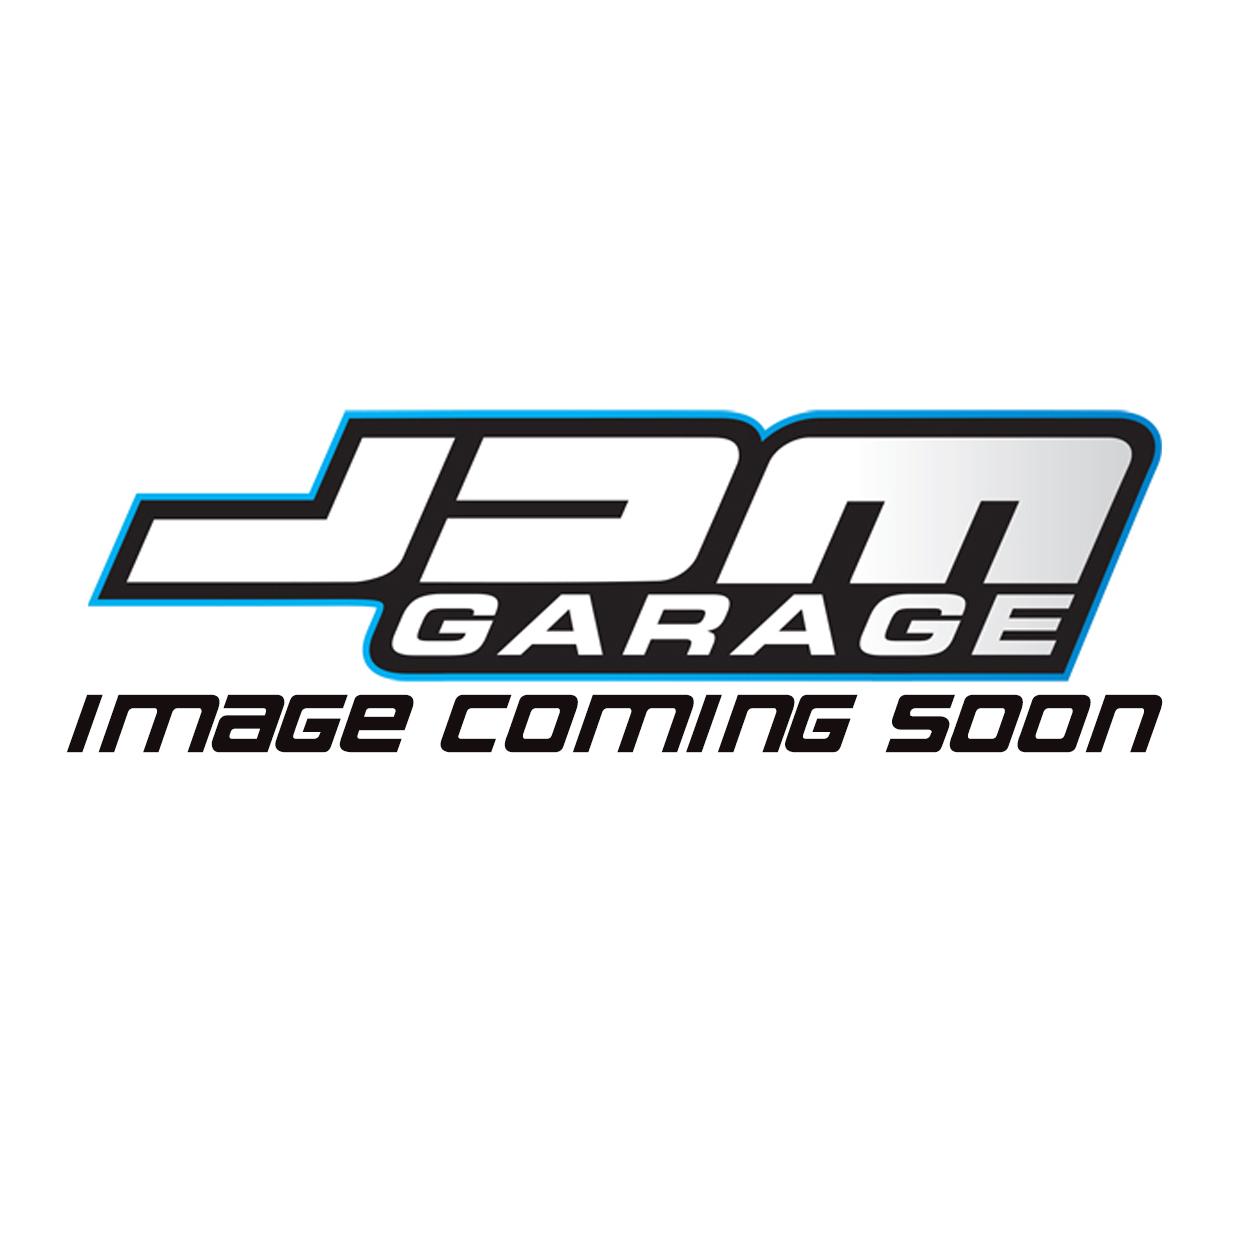 Mcleod Tuner Series Clutches Subaru Impreza WRX 5 Speed 2002-2005 (Pull)